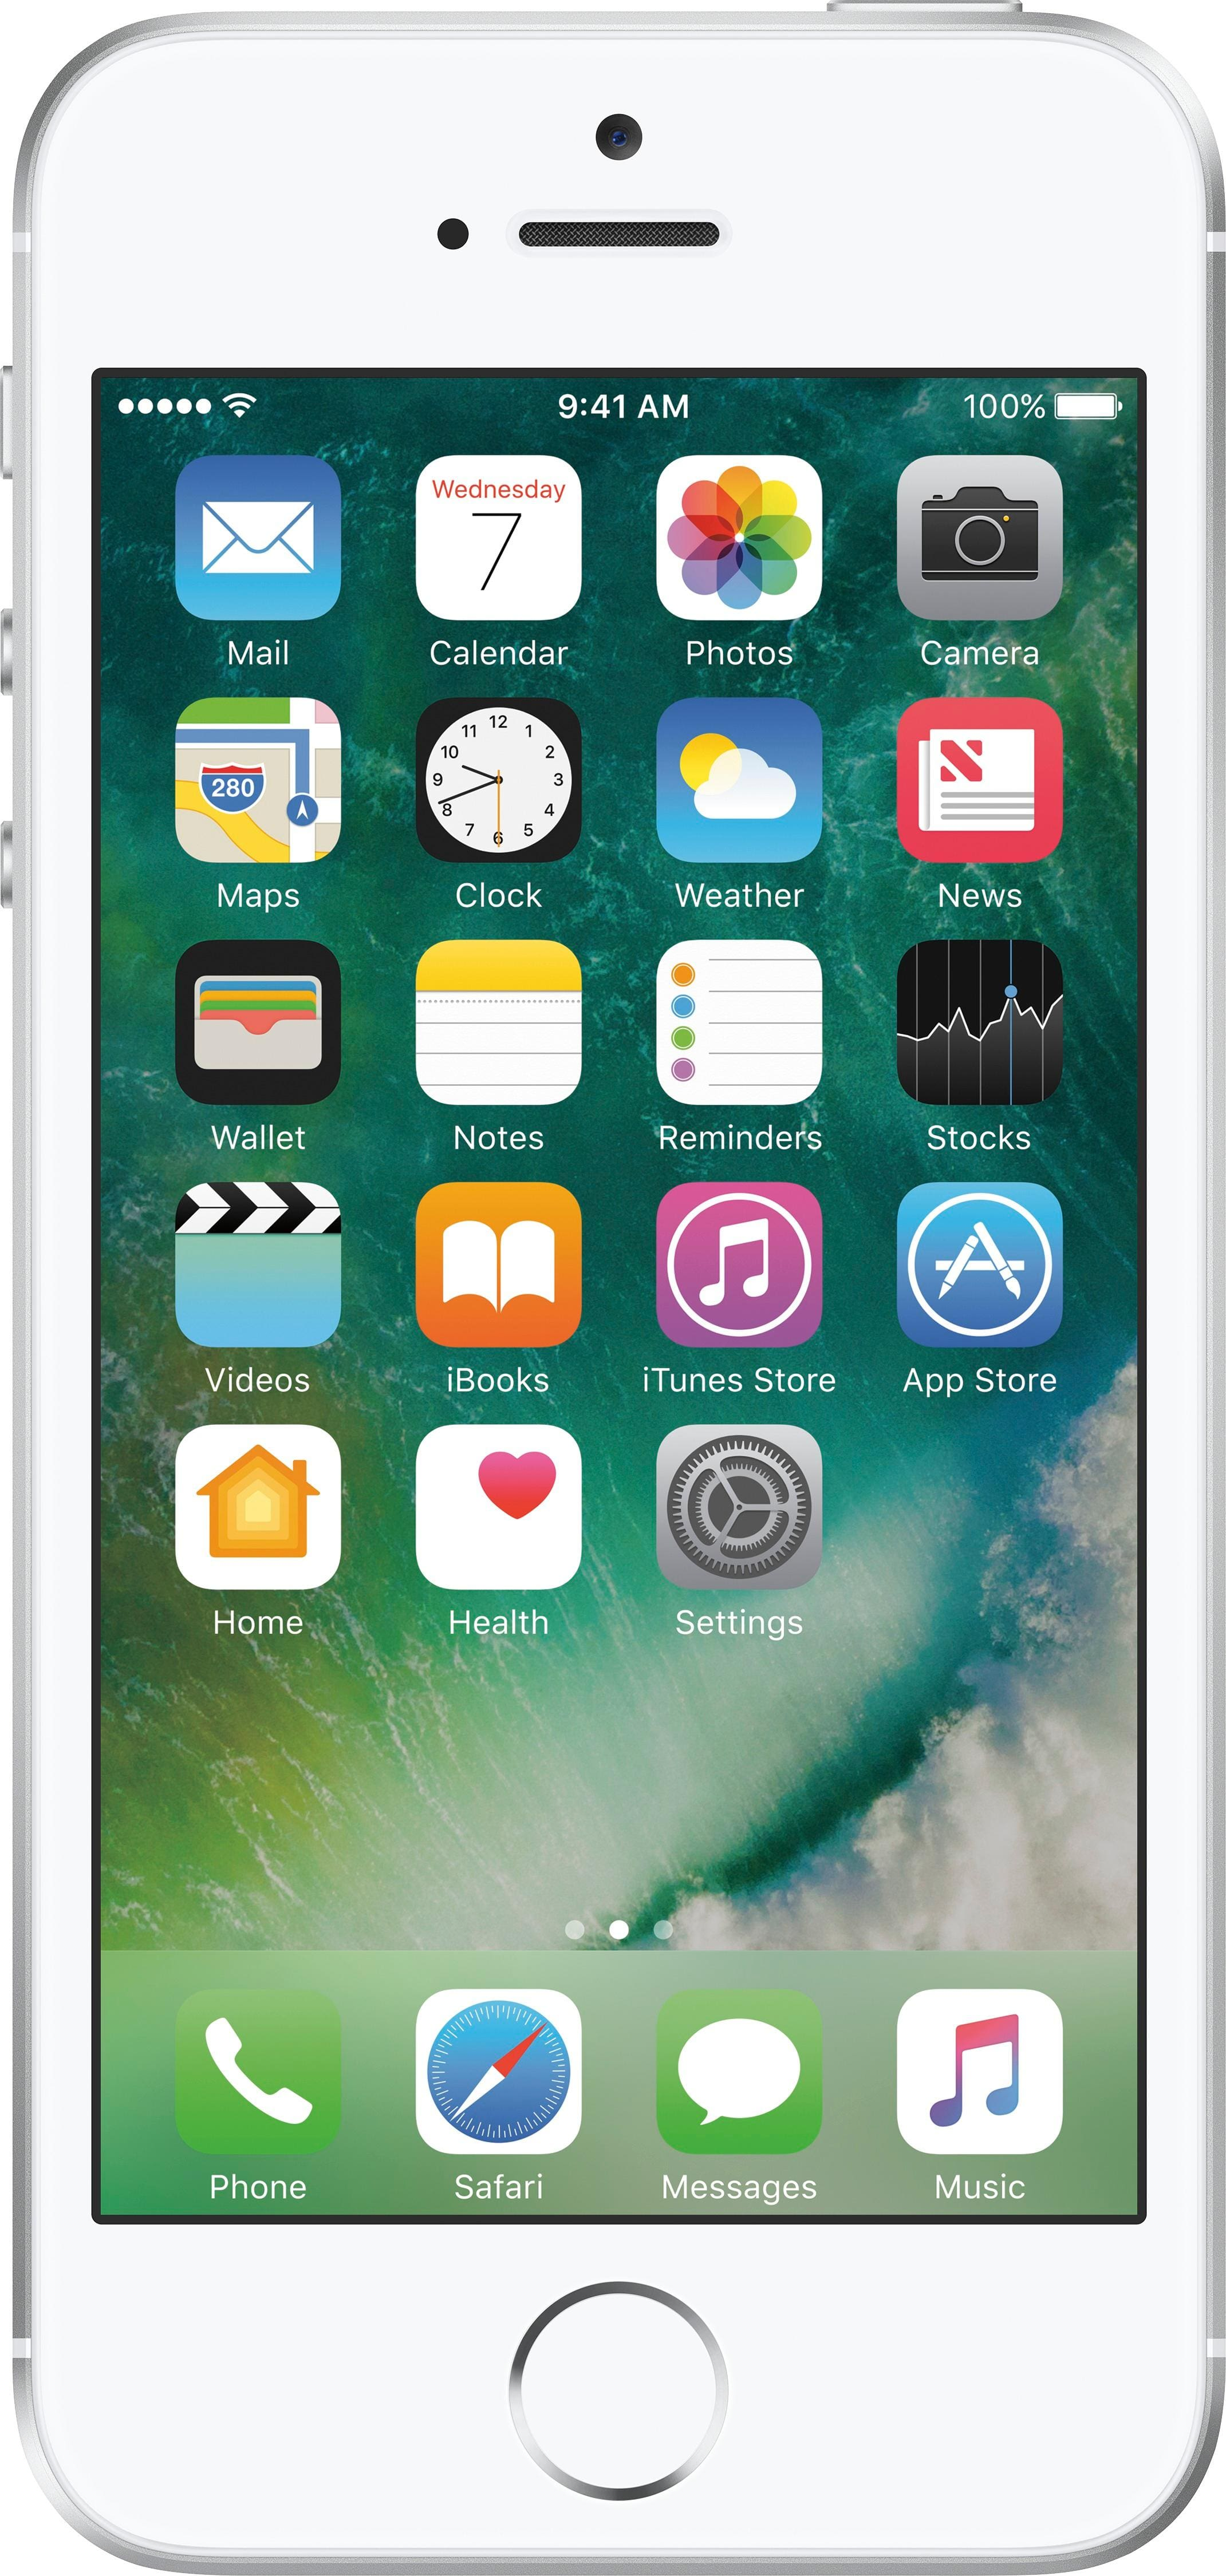 Unlocked iPhone SE 32GB $199 - Silver (Verizon) YMMV